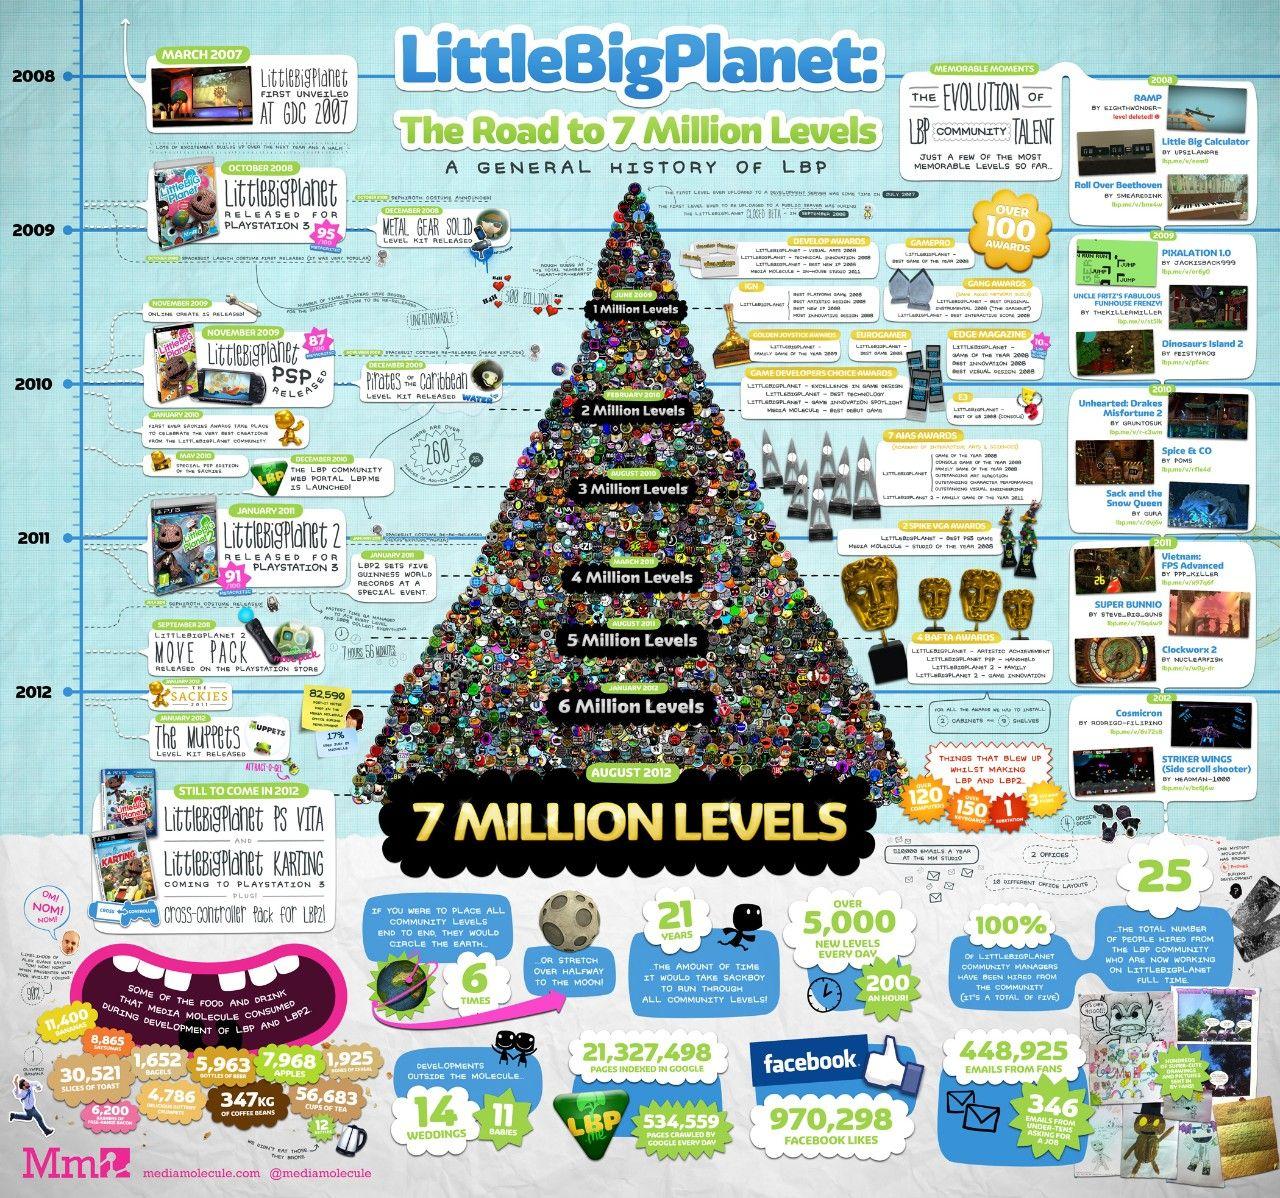 7 milioni di livelli per LittleBigPlanet